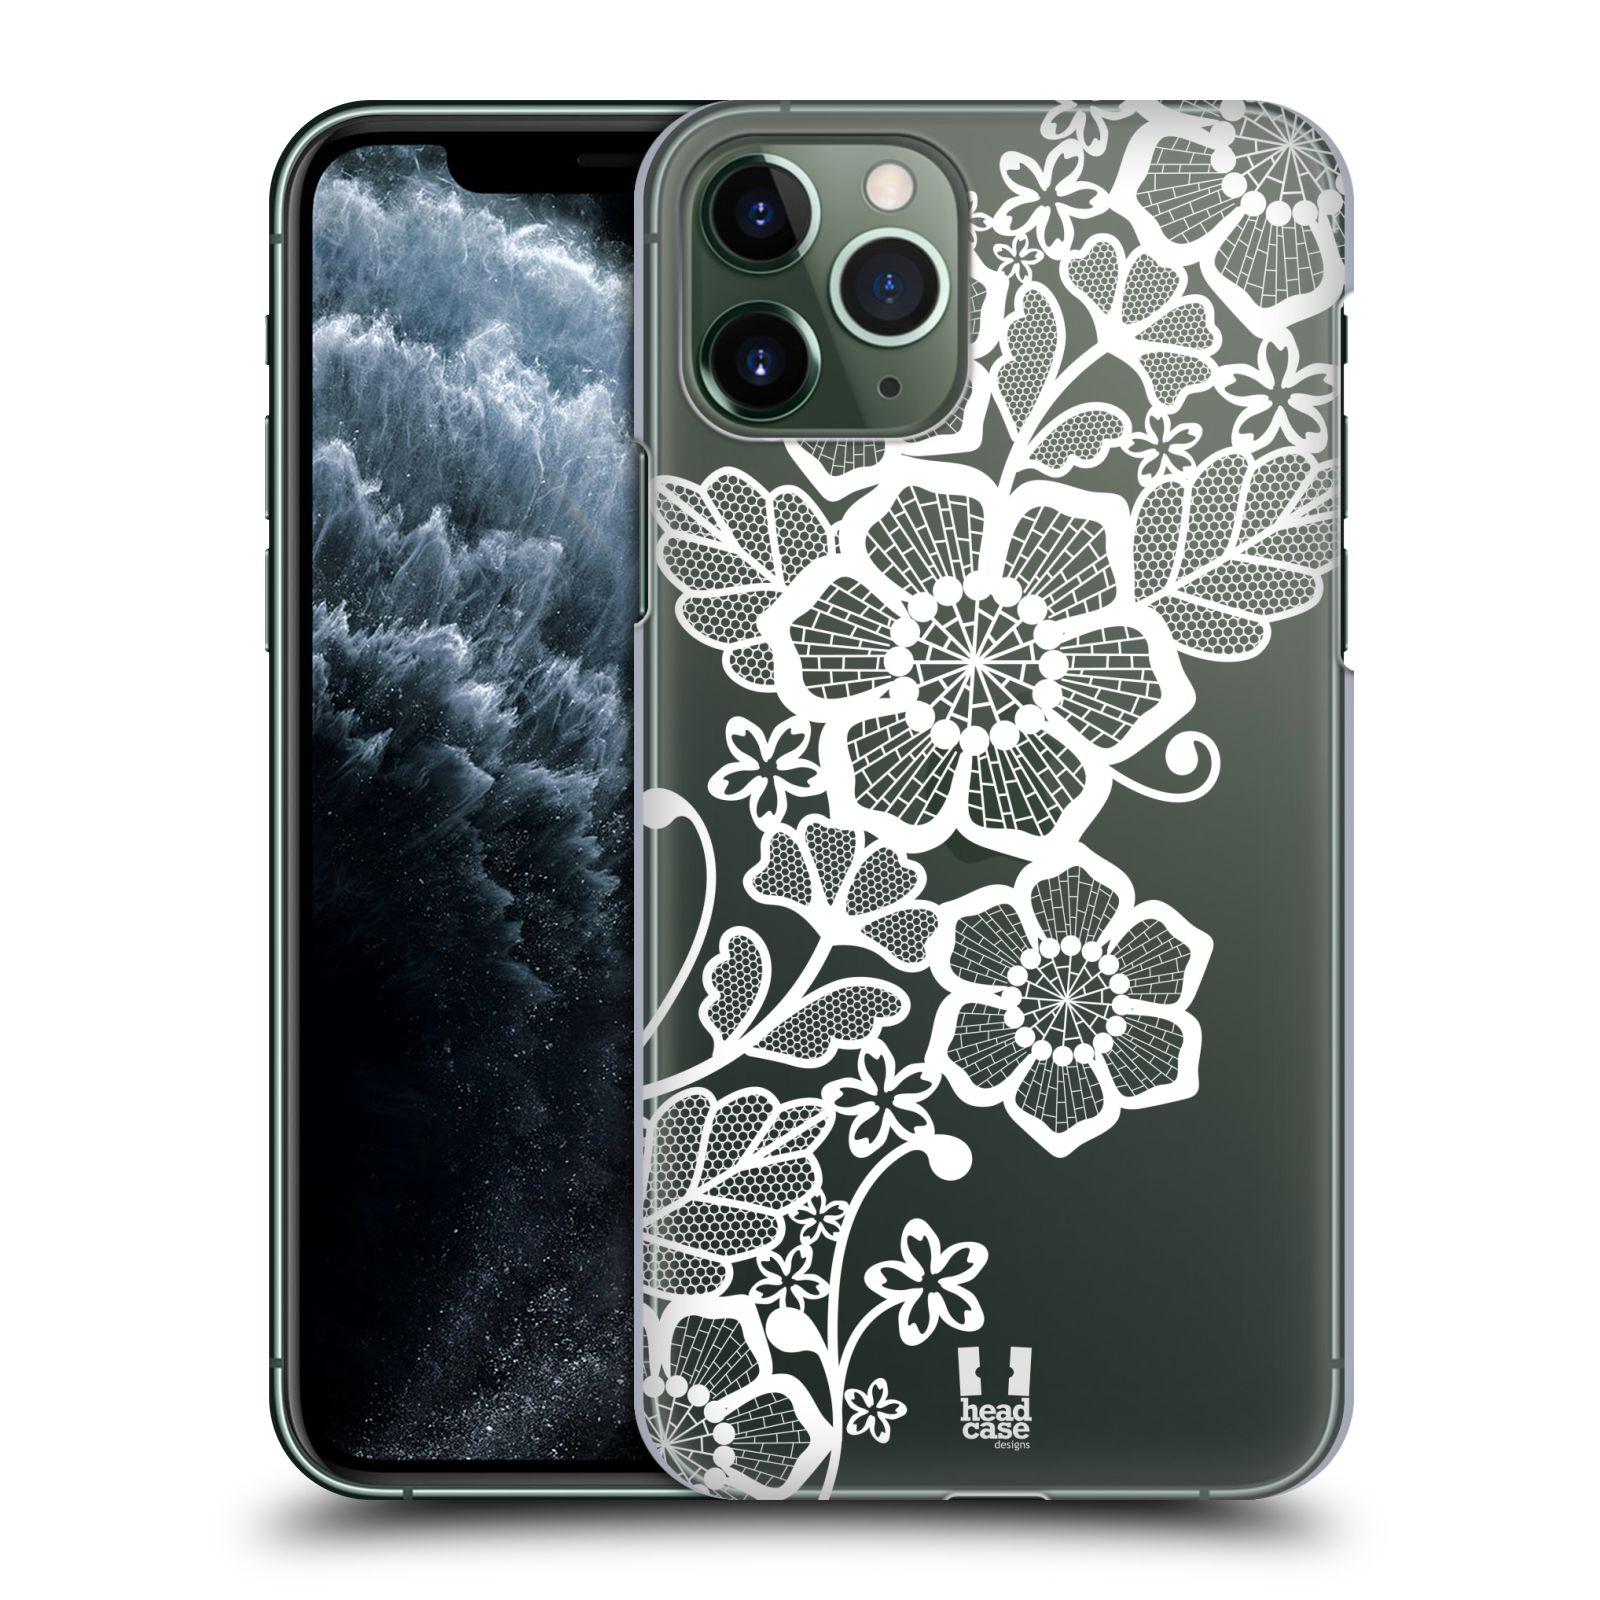 praha obaly iphone 8